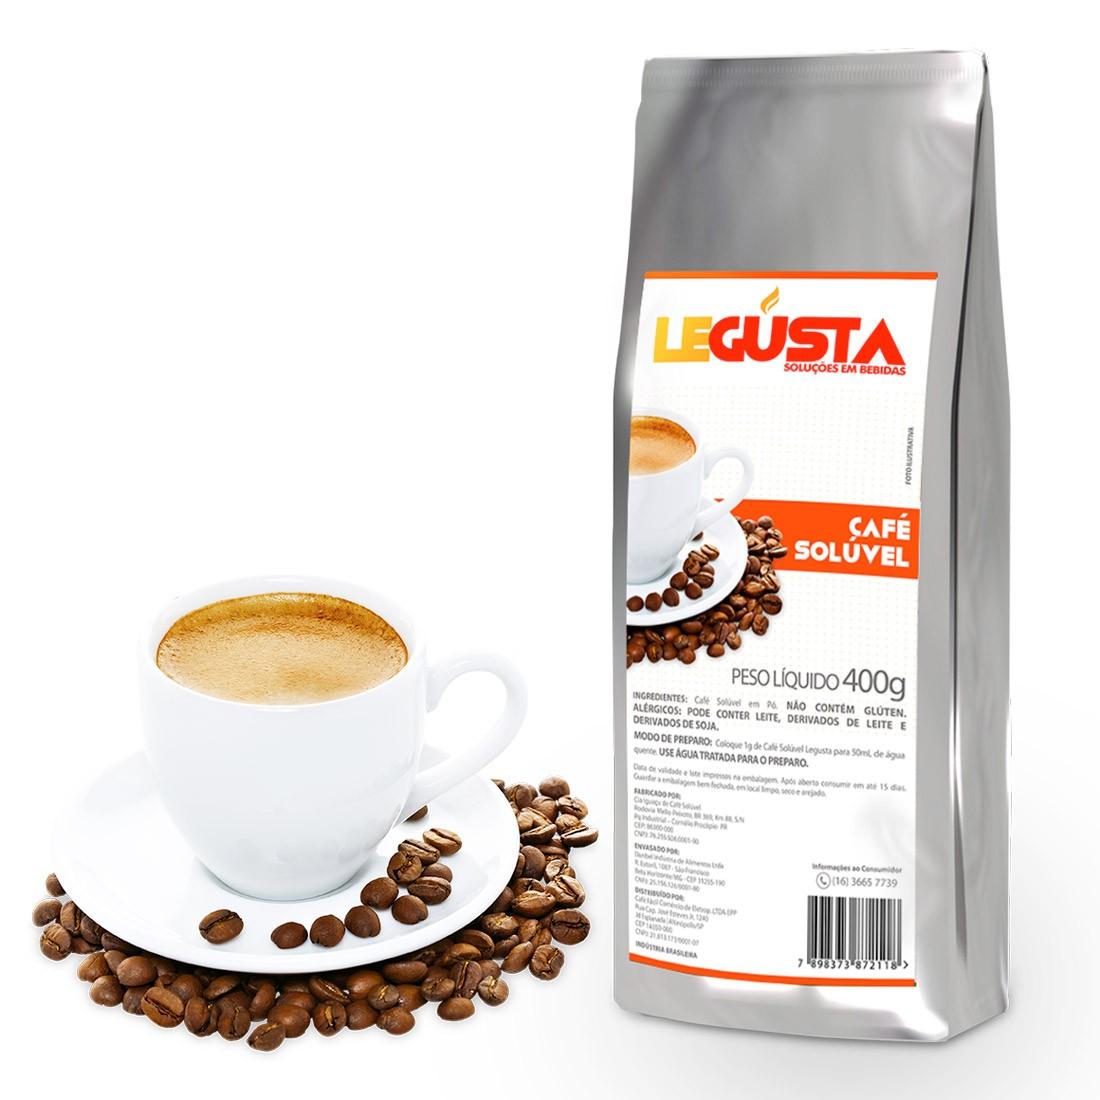 Café Solúvel Legusta 400g